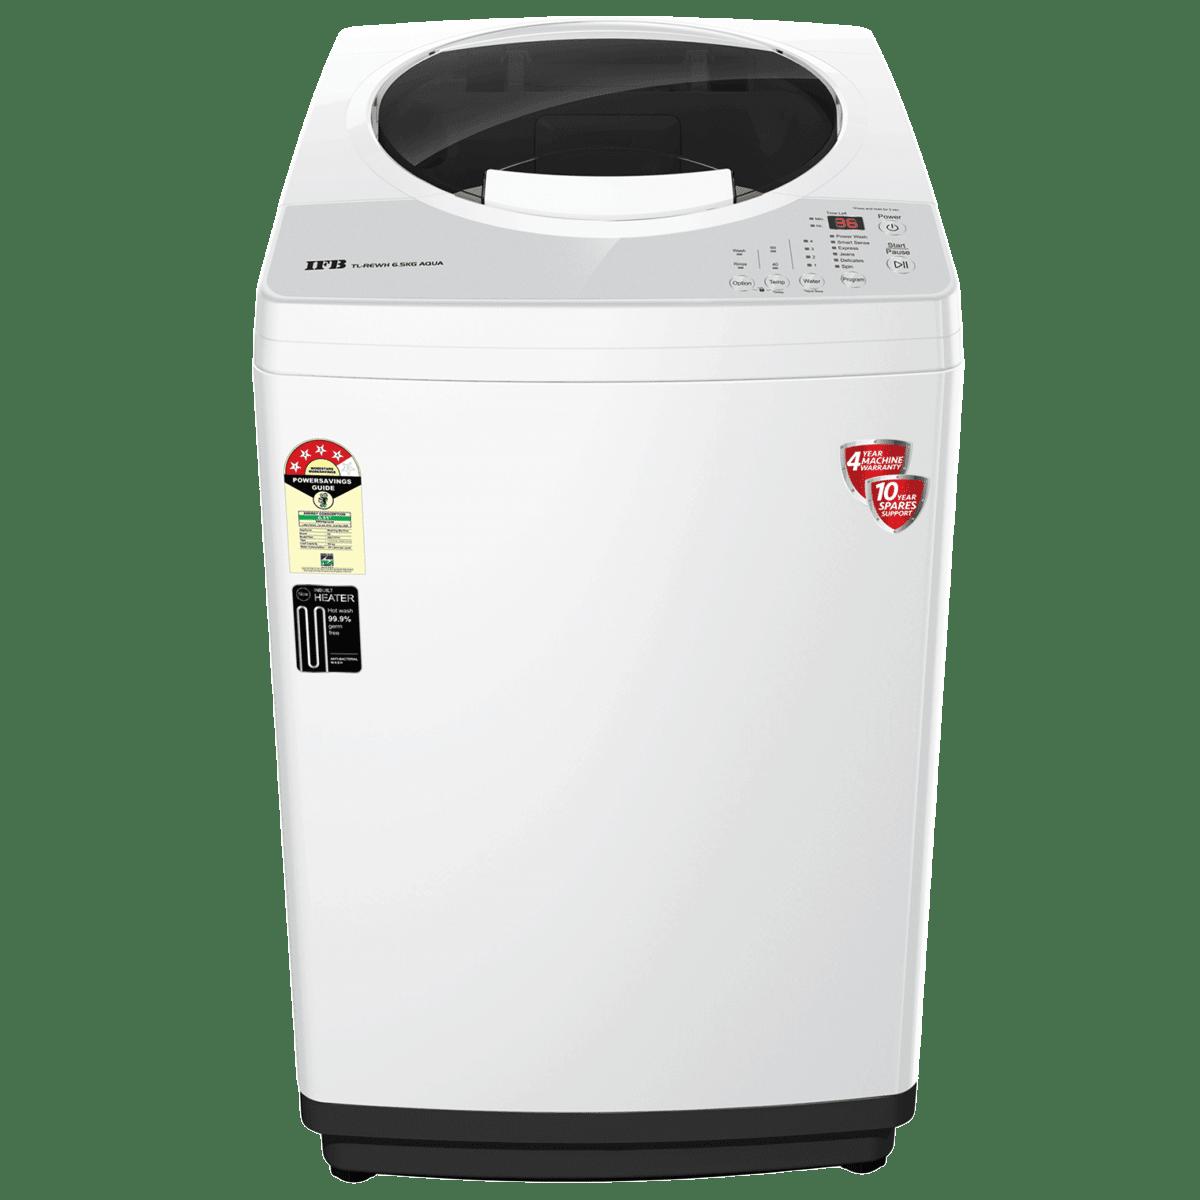 IFB Aqua 6.5 kg 5 Star Fully Automatic Top Load Washing Machine (Smart Weight Senser, TL-REWH, PCM - White)